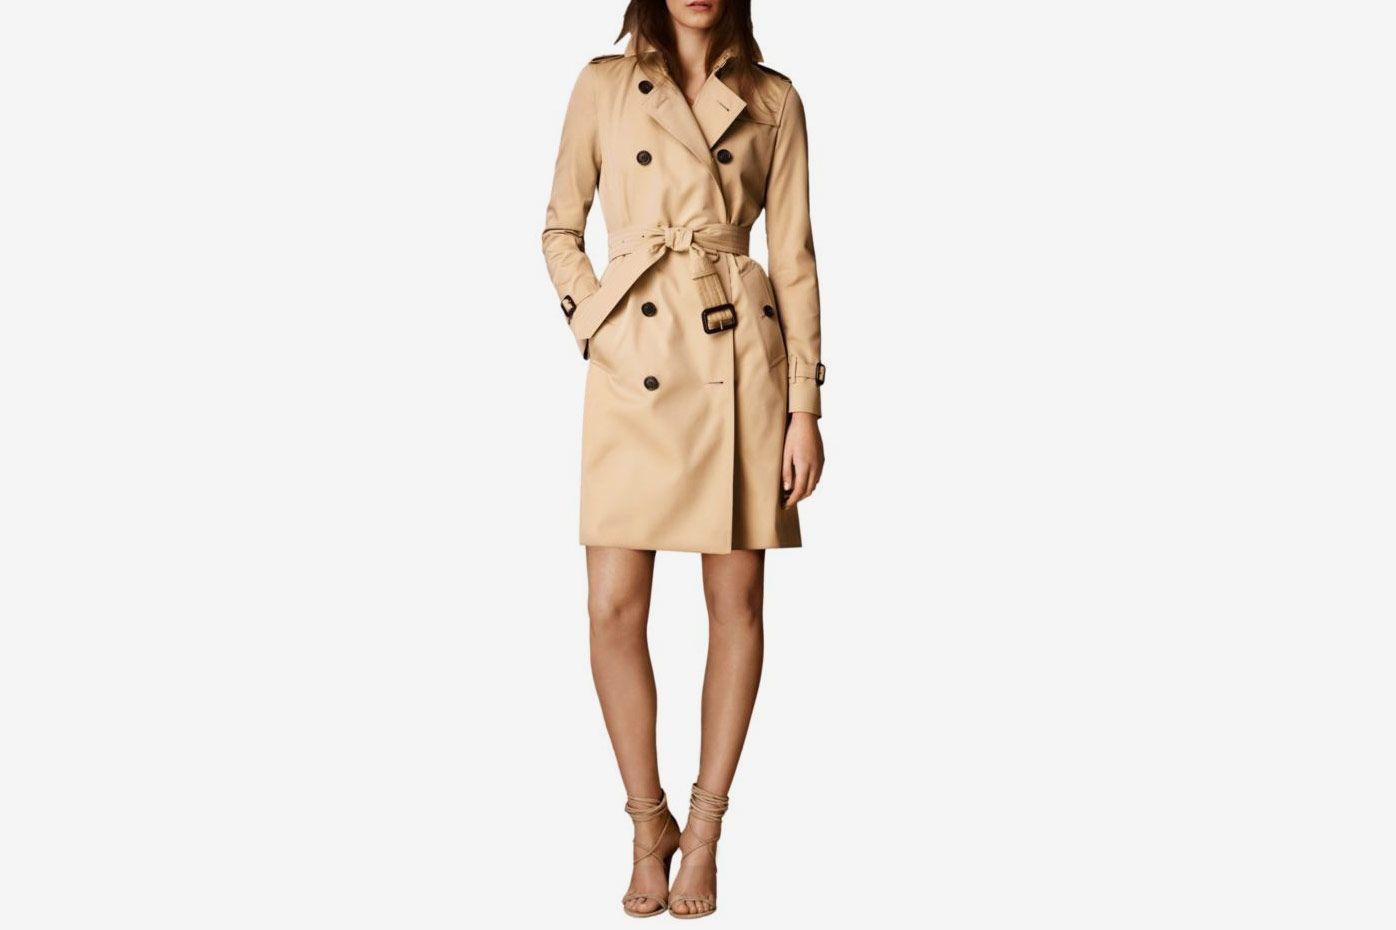 Burberry Kensington Long Heritage Trench Coat Color: